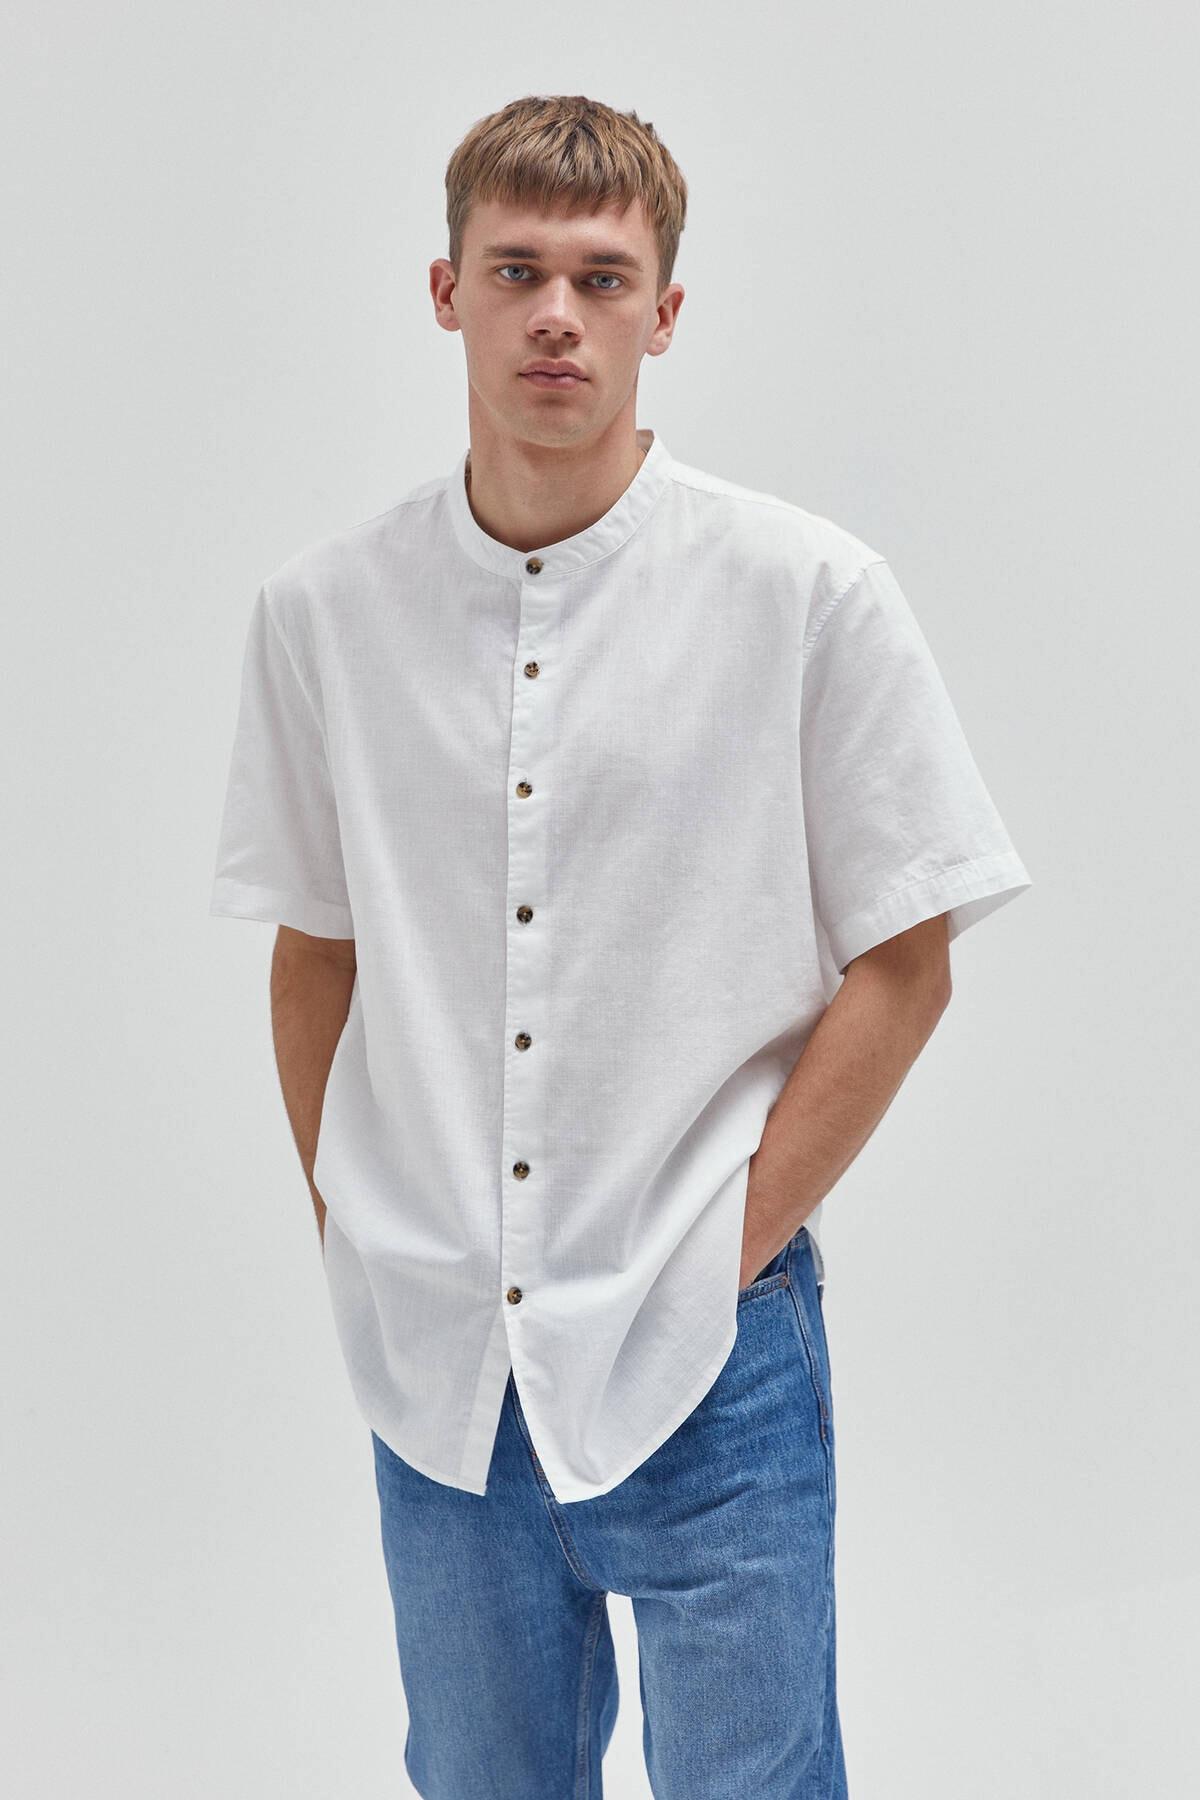 Pull & Bear Erkek Kısa Kollu Hakim Yaka Basic Gömlek 1